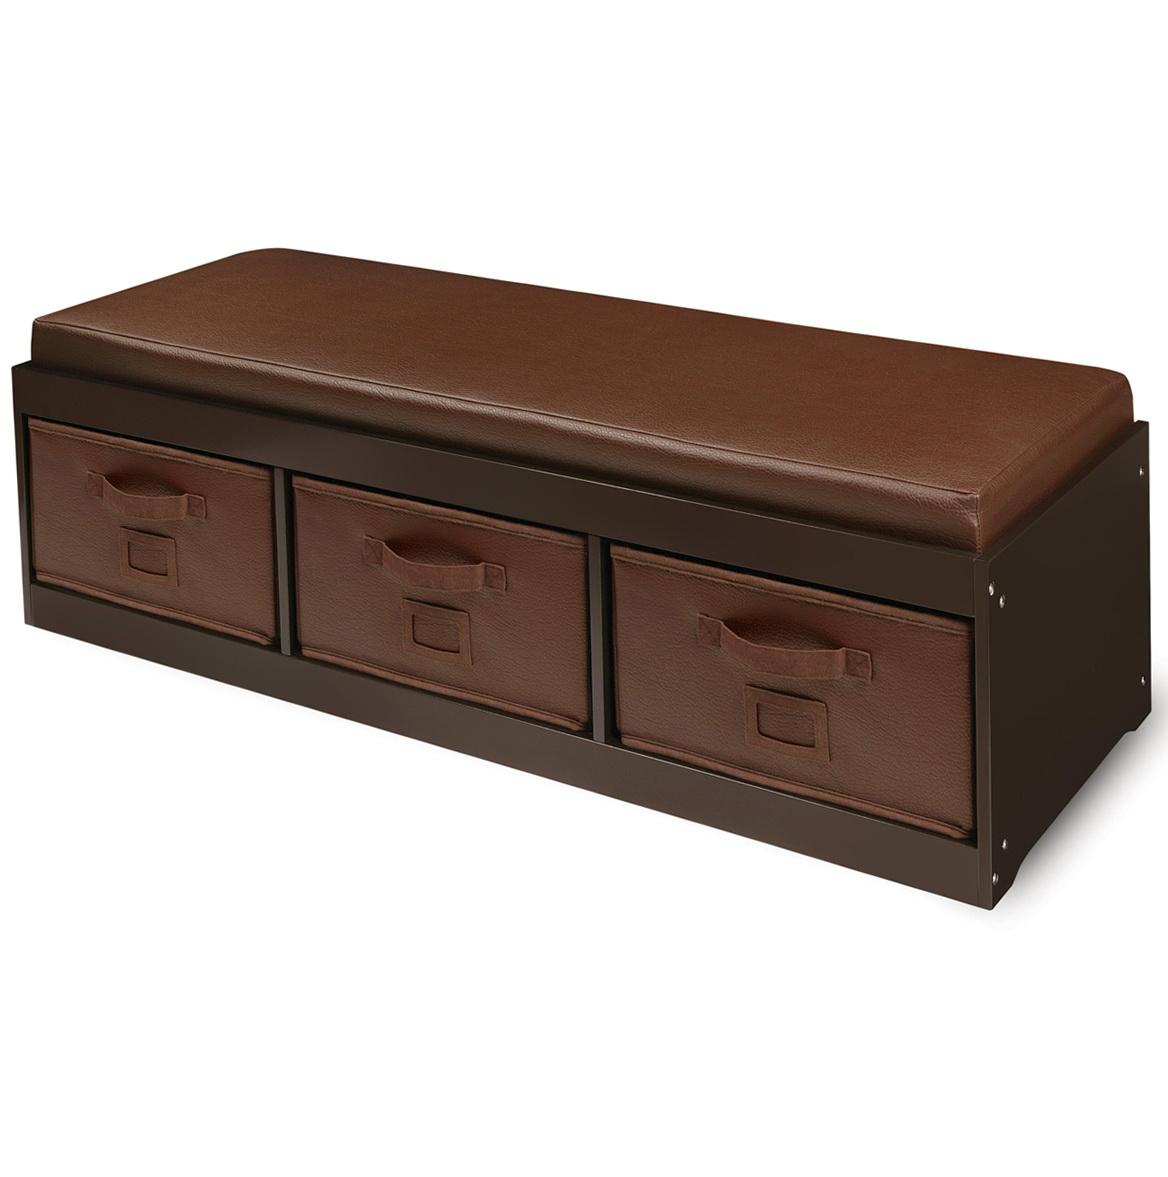 Toy Storage Bench Seat